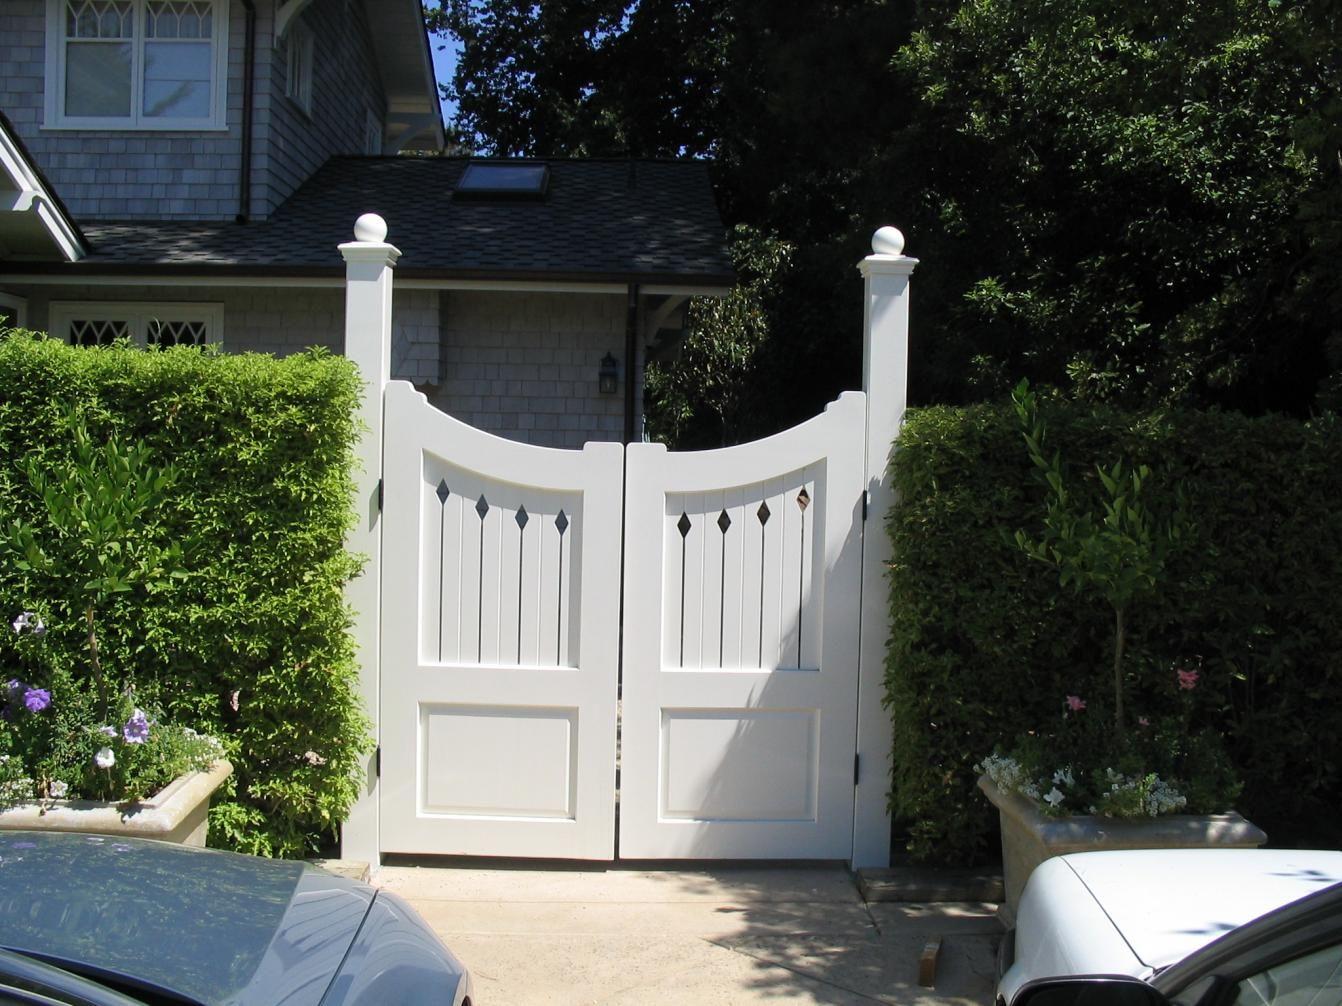 garden gates design. Suggestions on design for wooden driveway gate  Pin by Daphne Krampe garden gates Pinterest Gate Gates and